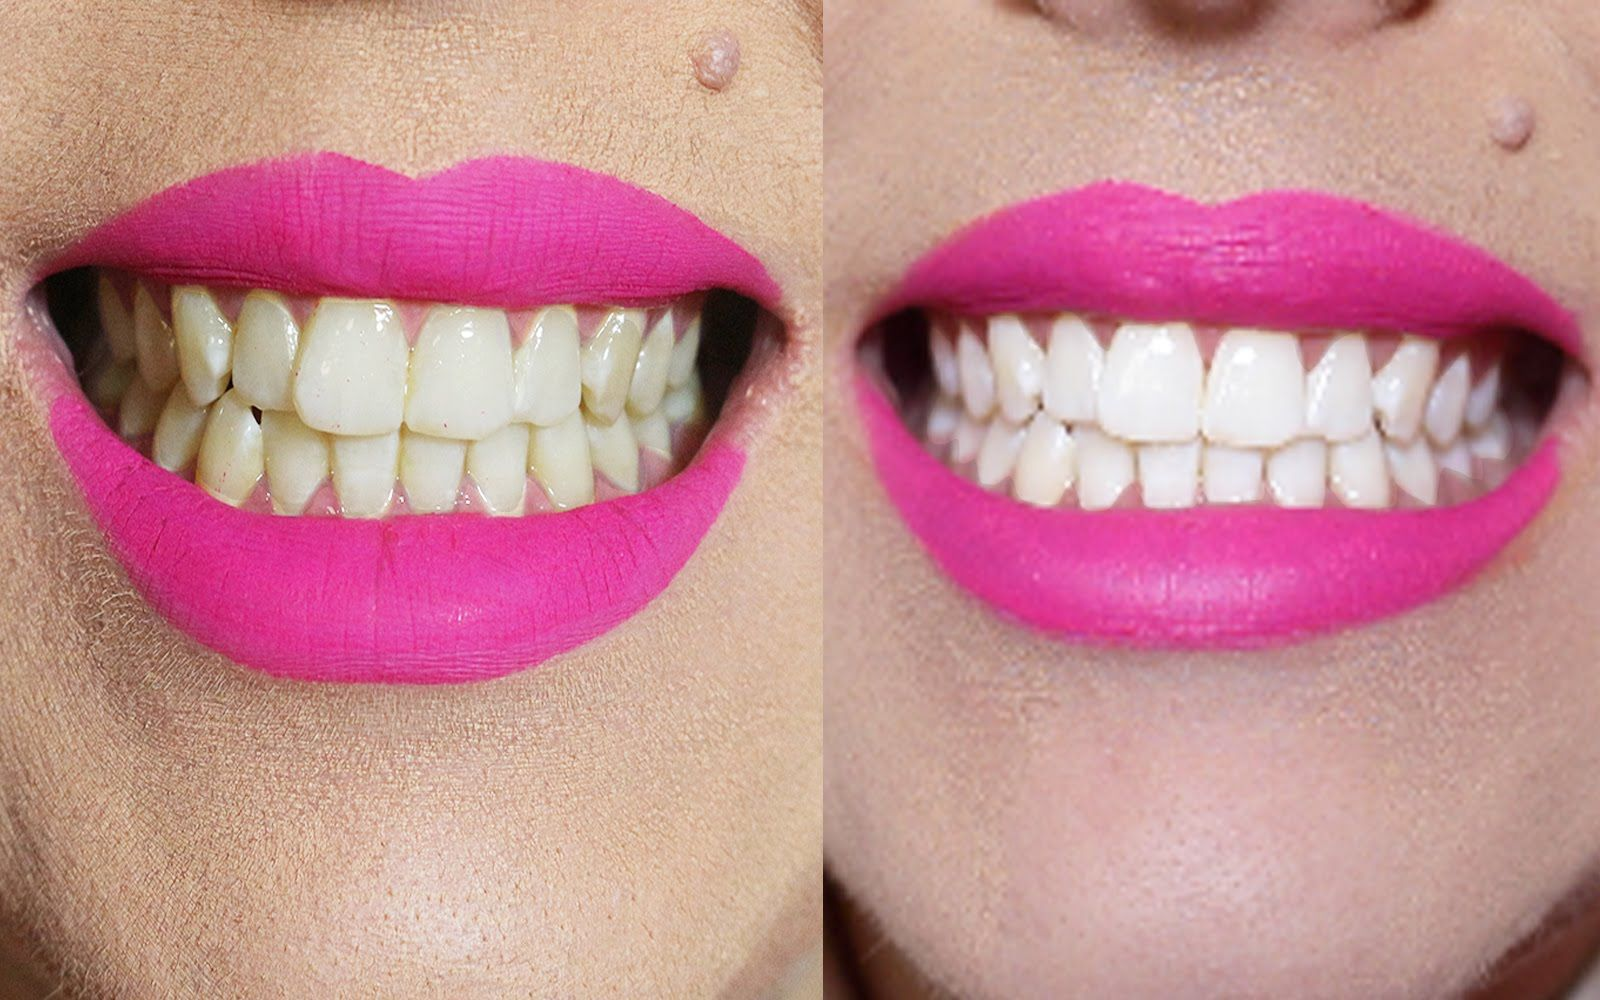 Dentes Brancos Em 2 Minutos Receita Caseira Remedios Caseiros